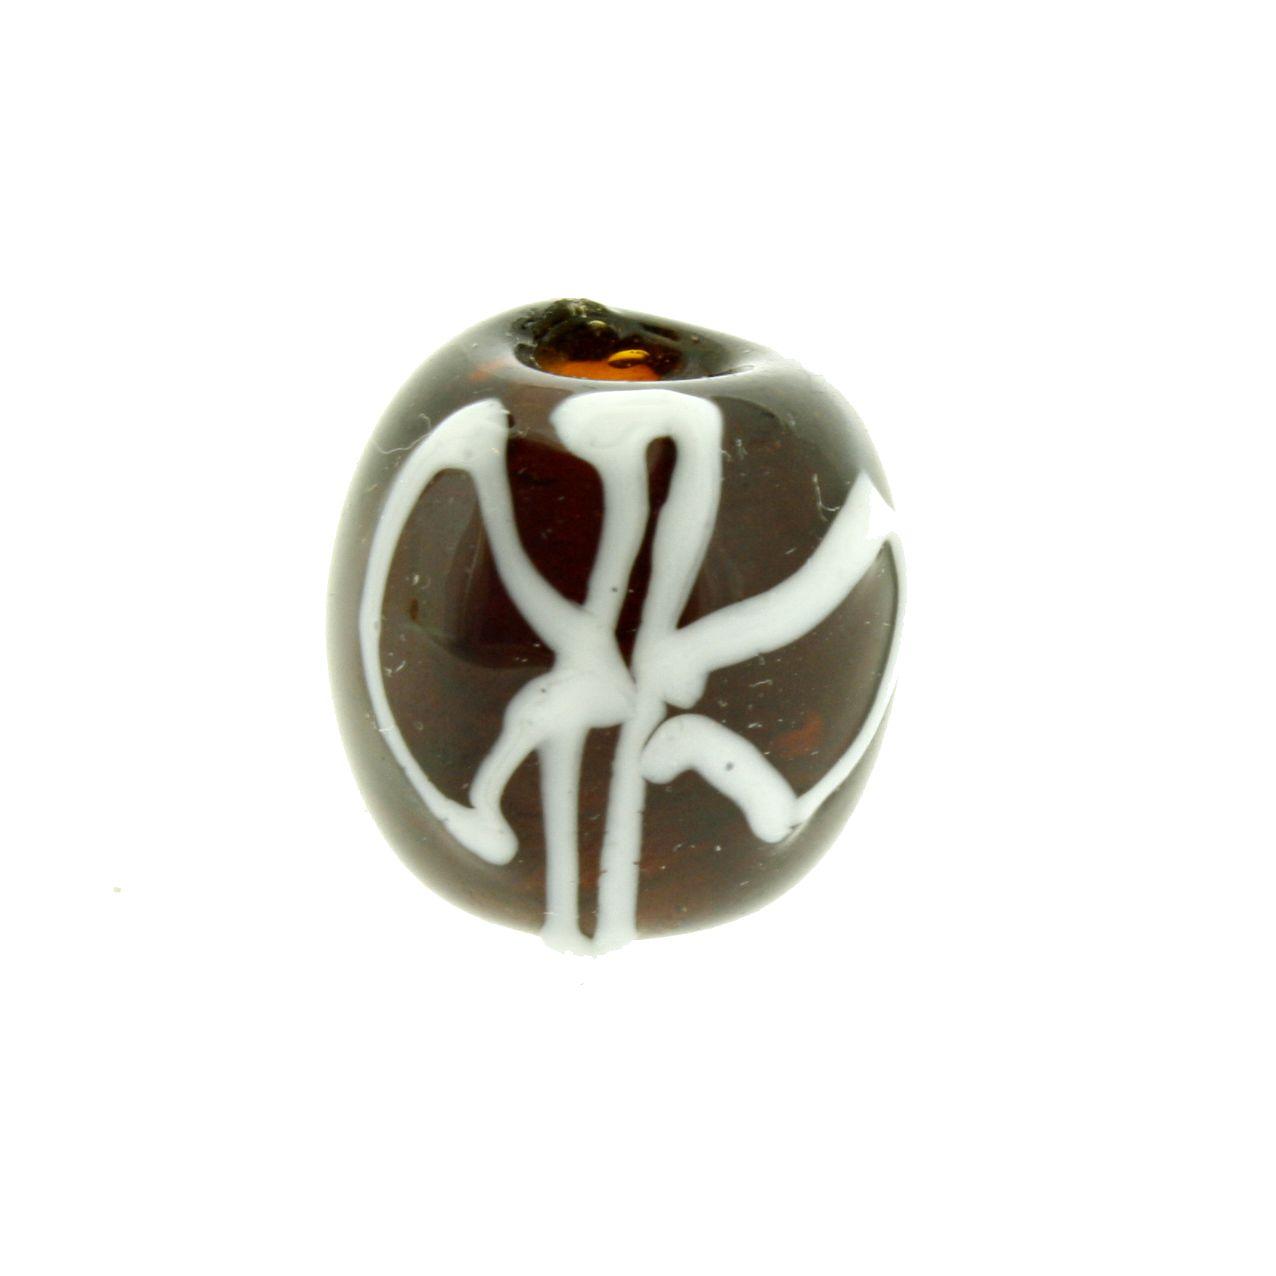 Firma Bola - Xangô - 1 Peça  - Stéphanie Bijoux® - Peças para Bijuterias e Artesanato